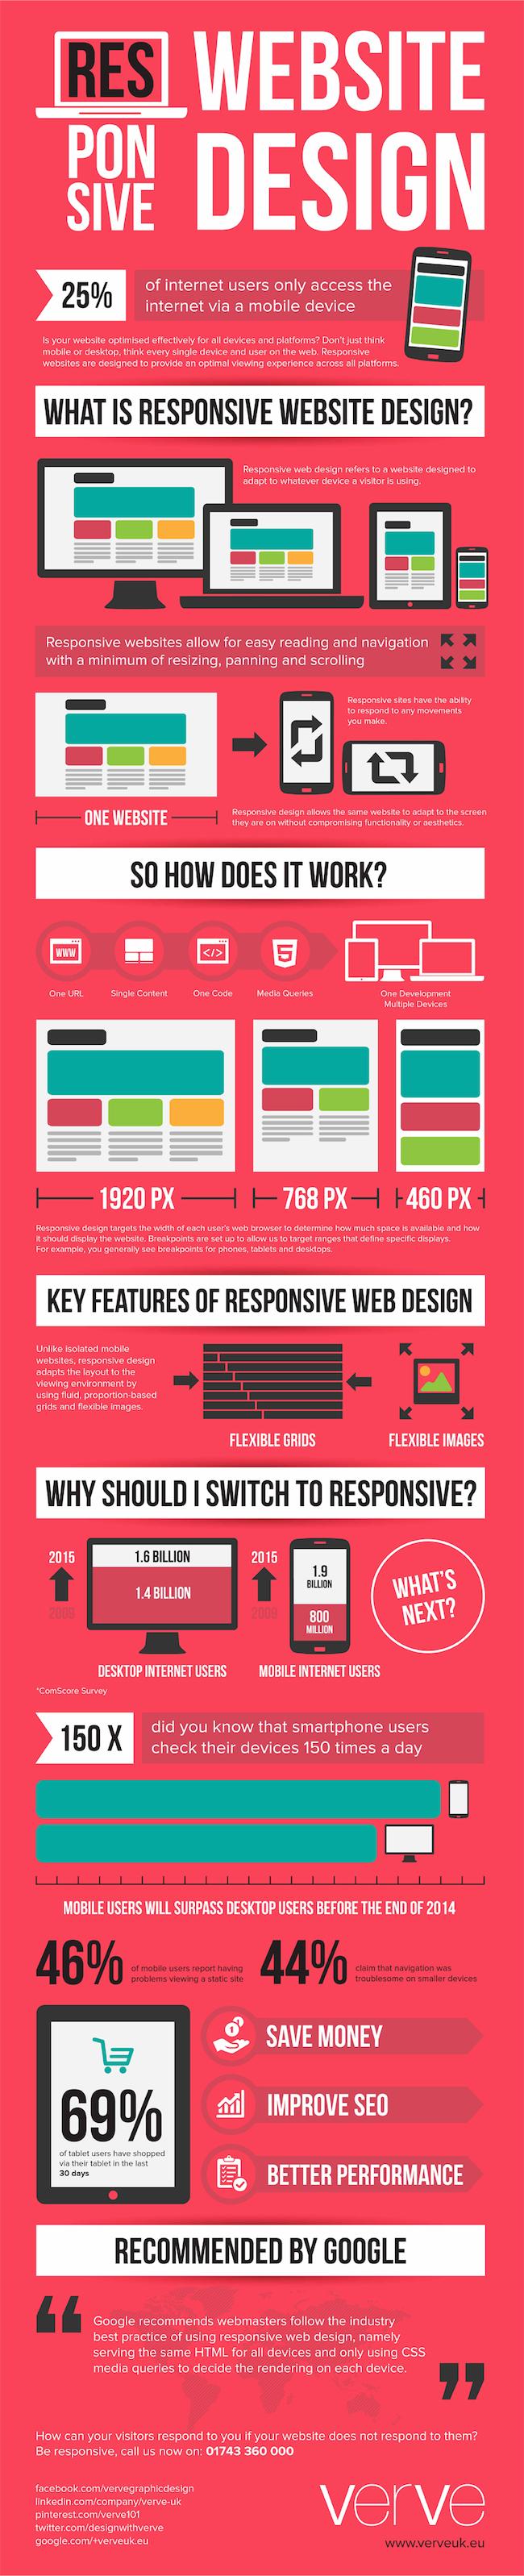 Responsive Website Design Guide